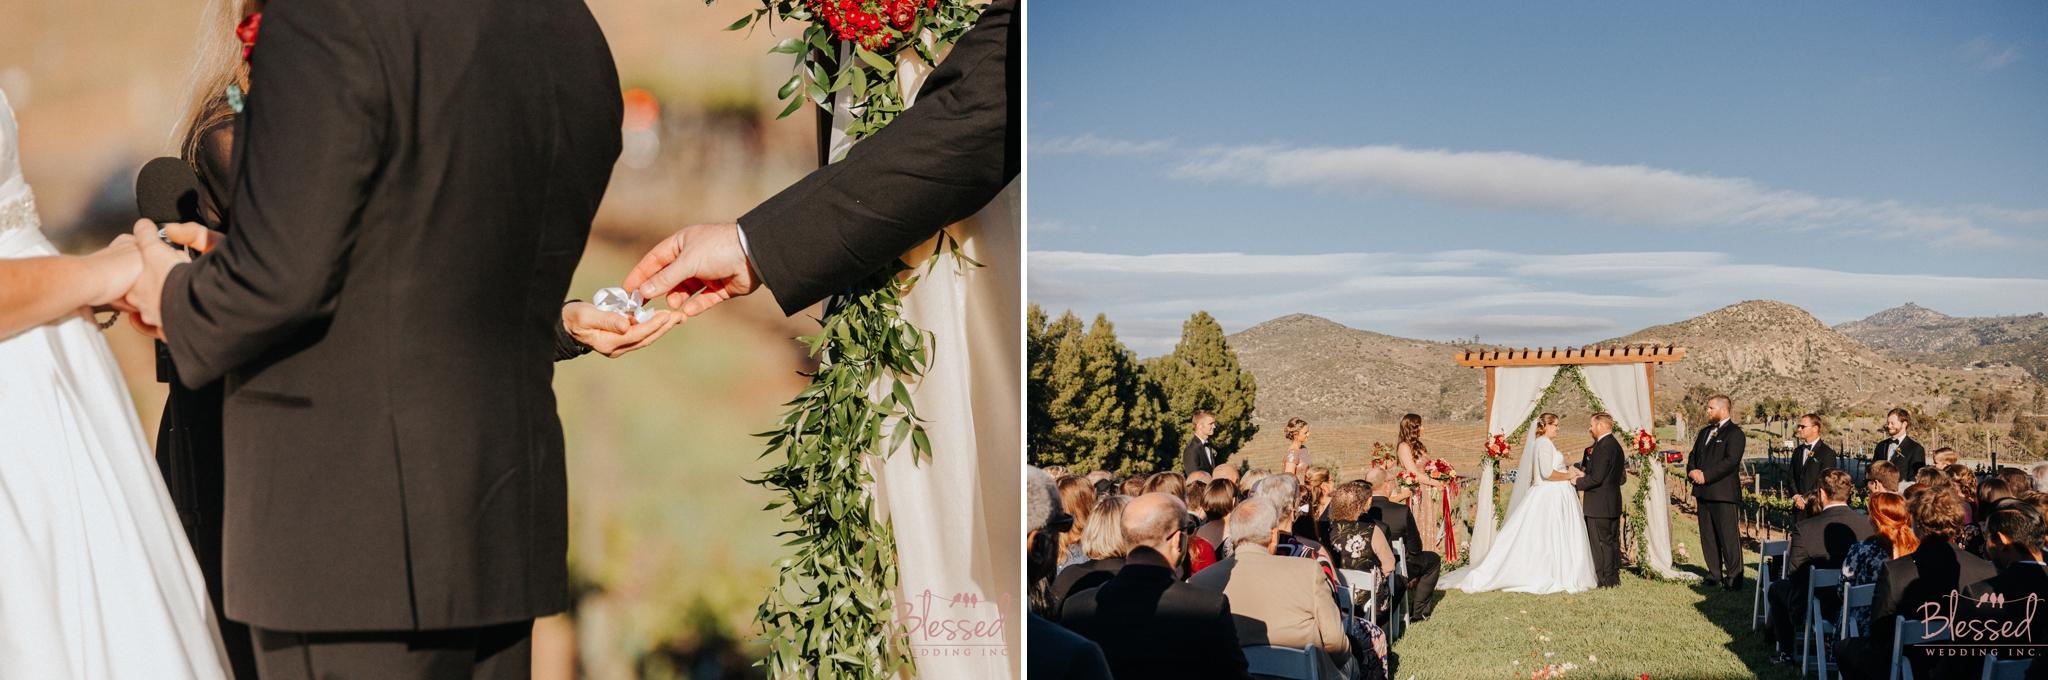 Orfila Vinery Wedding Temecula Wedding Photographer 18.jpg